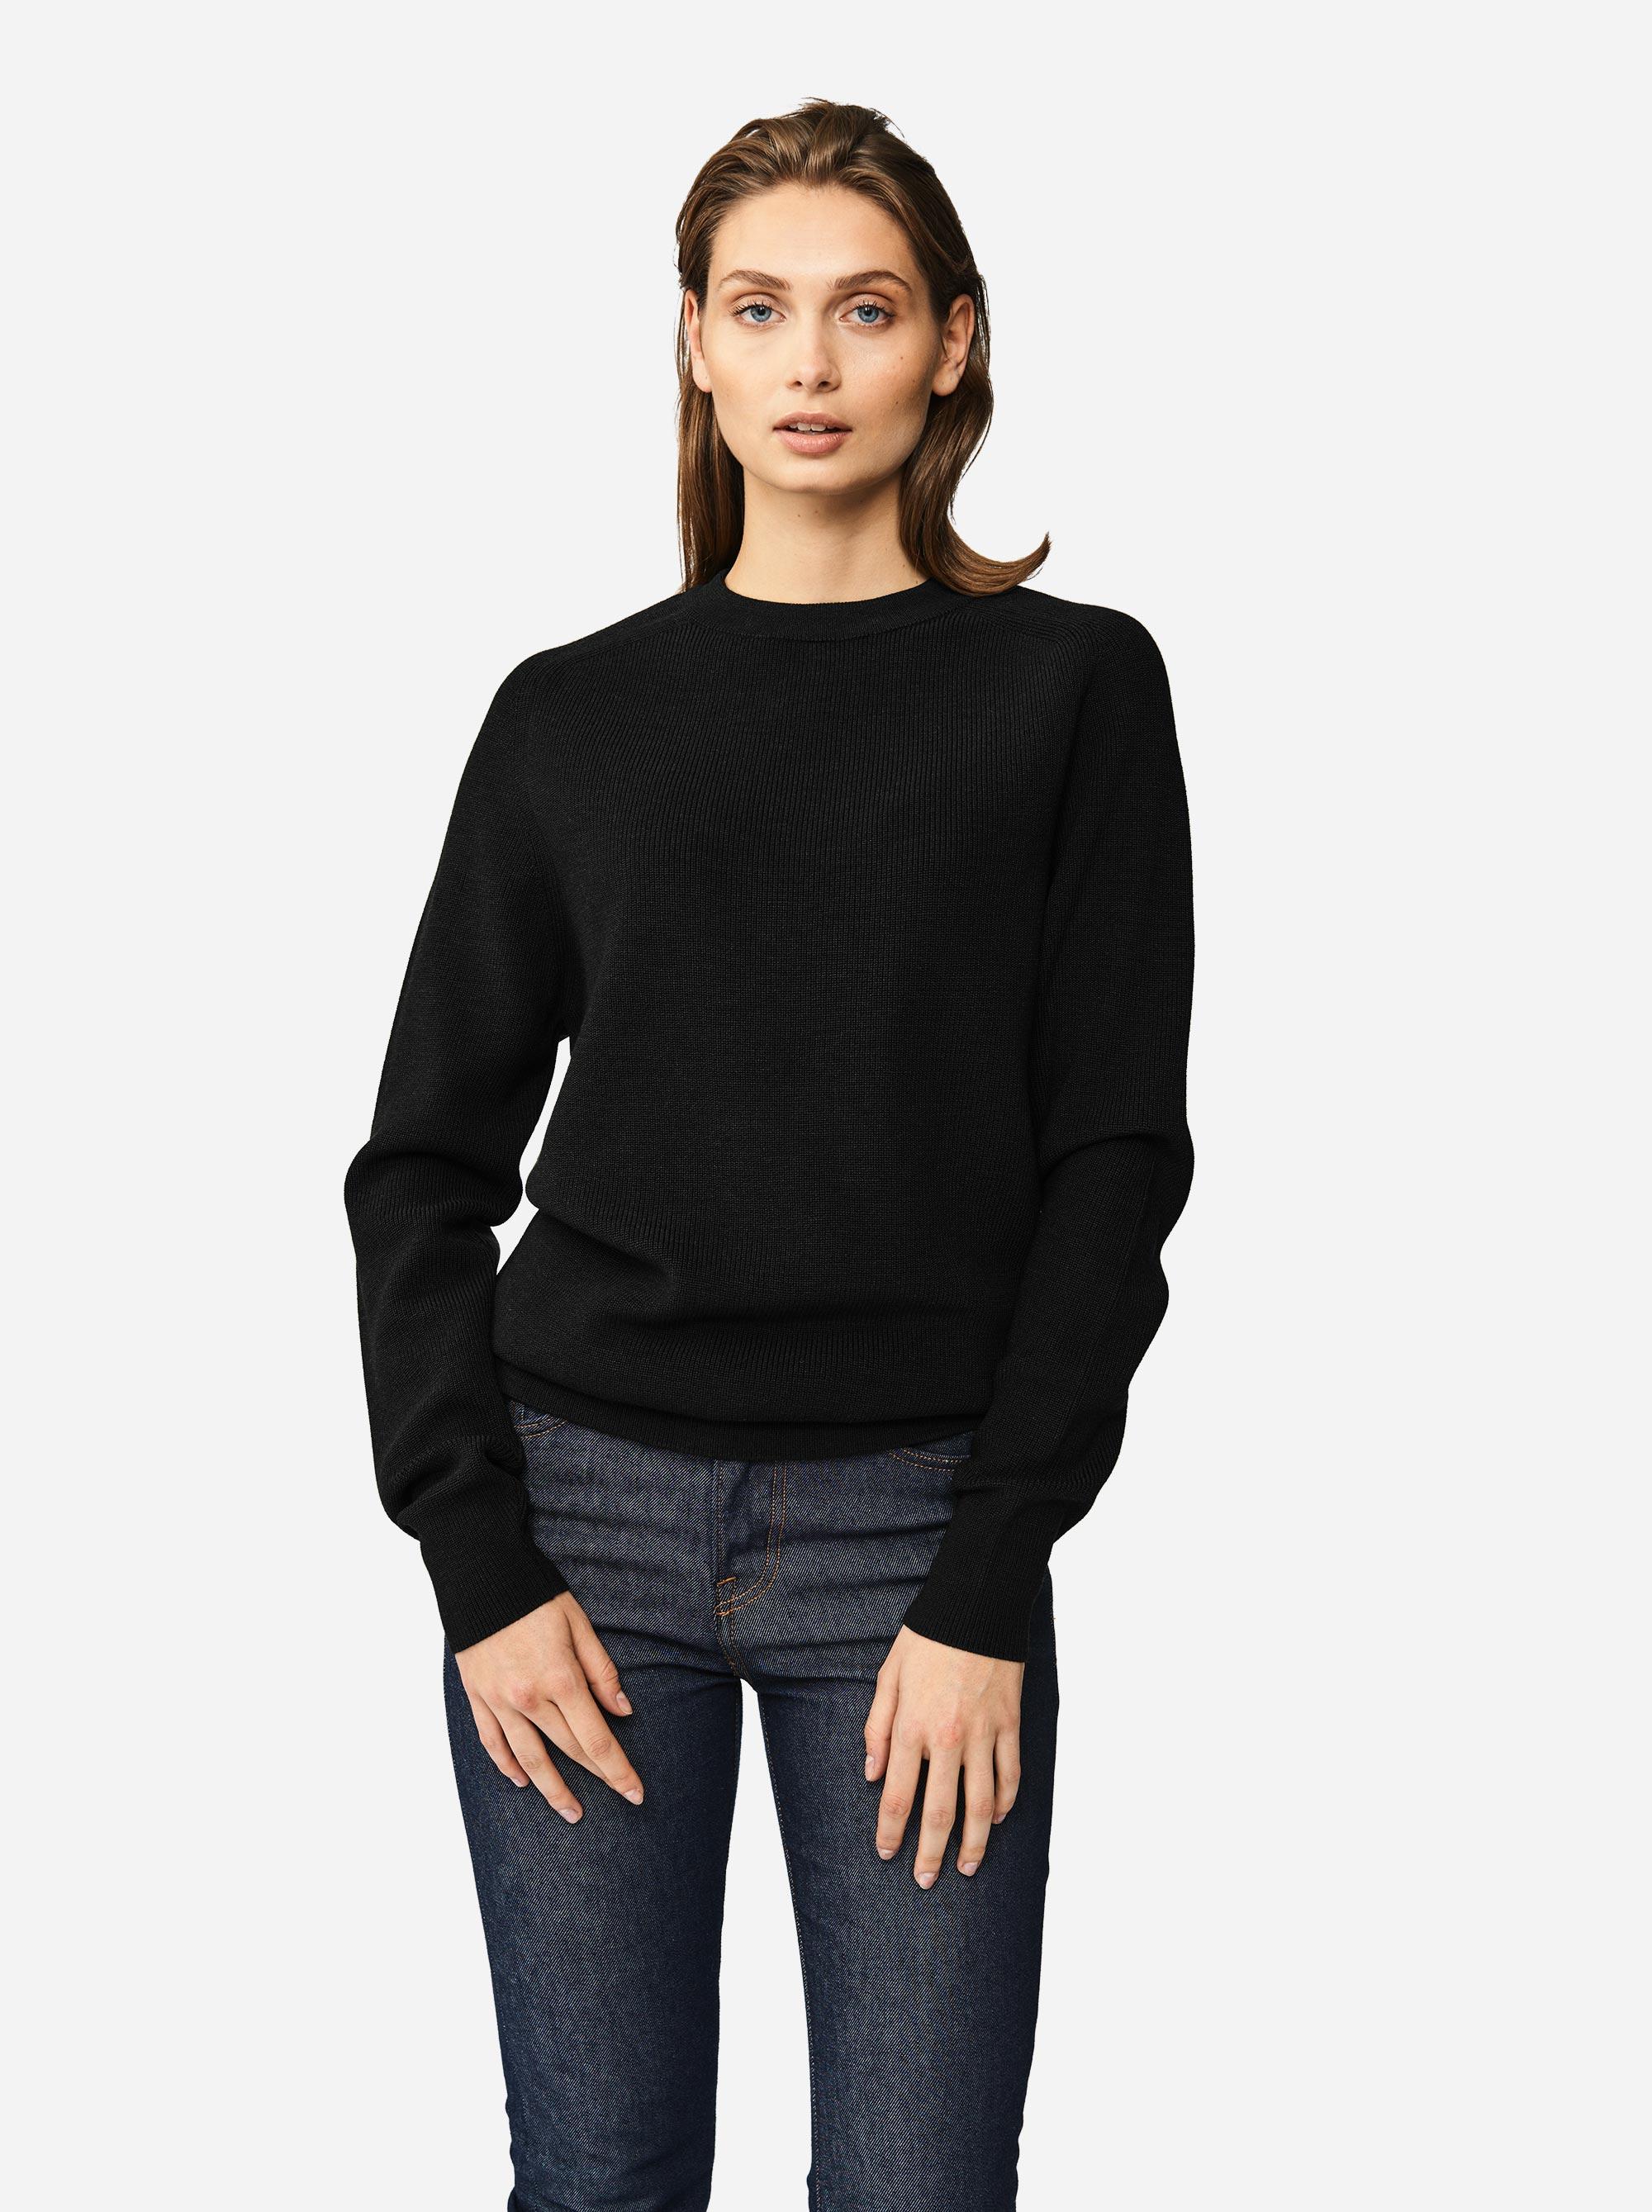 Teym - Crewneck - The Merino Sweater - Women - Black - 1